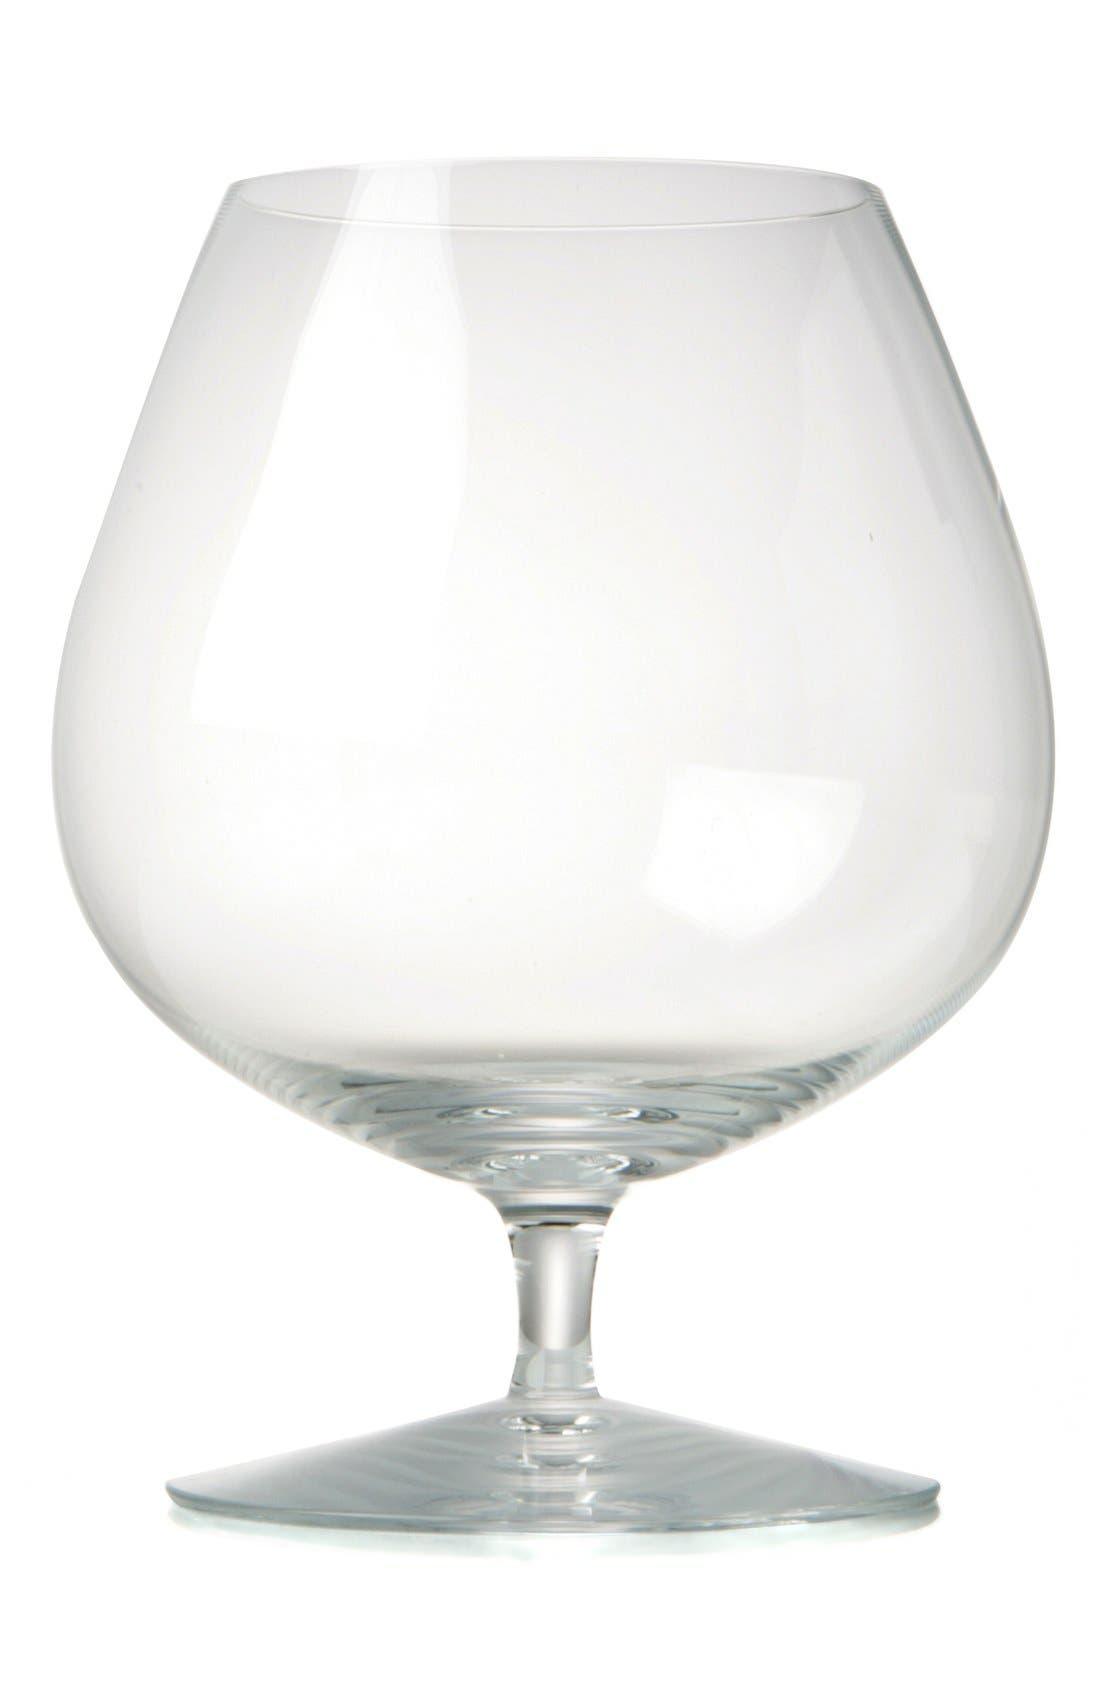 Main Image - Rogaska Crystal 'Expert' Cognac Glasses (Set of 2)